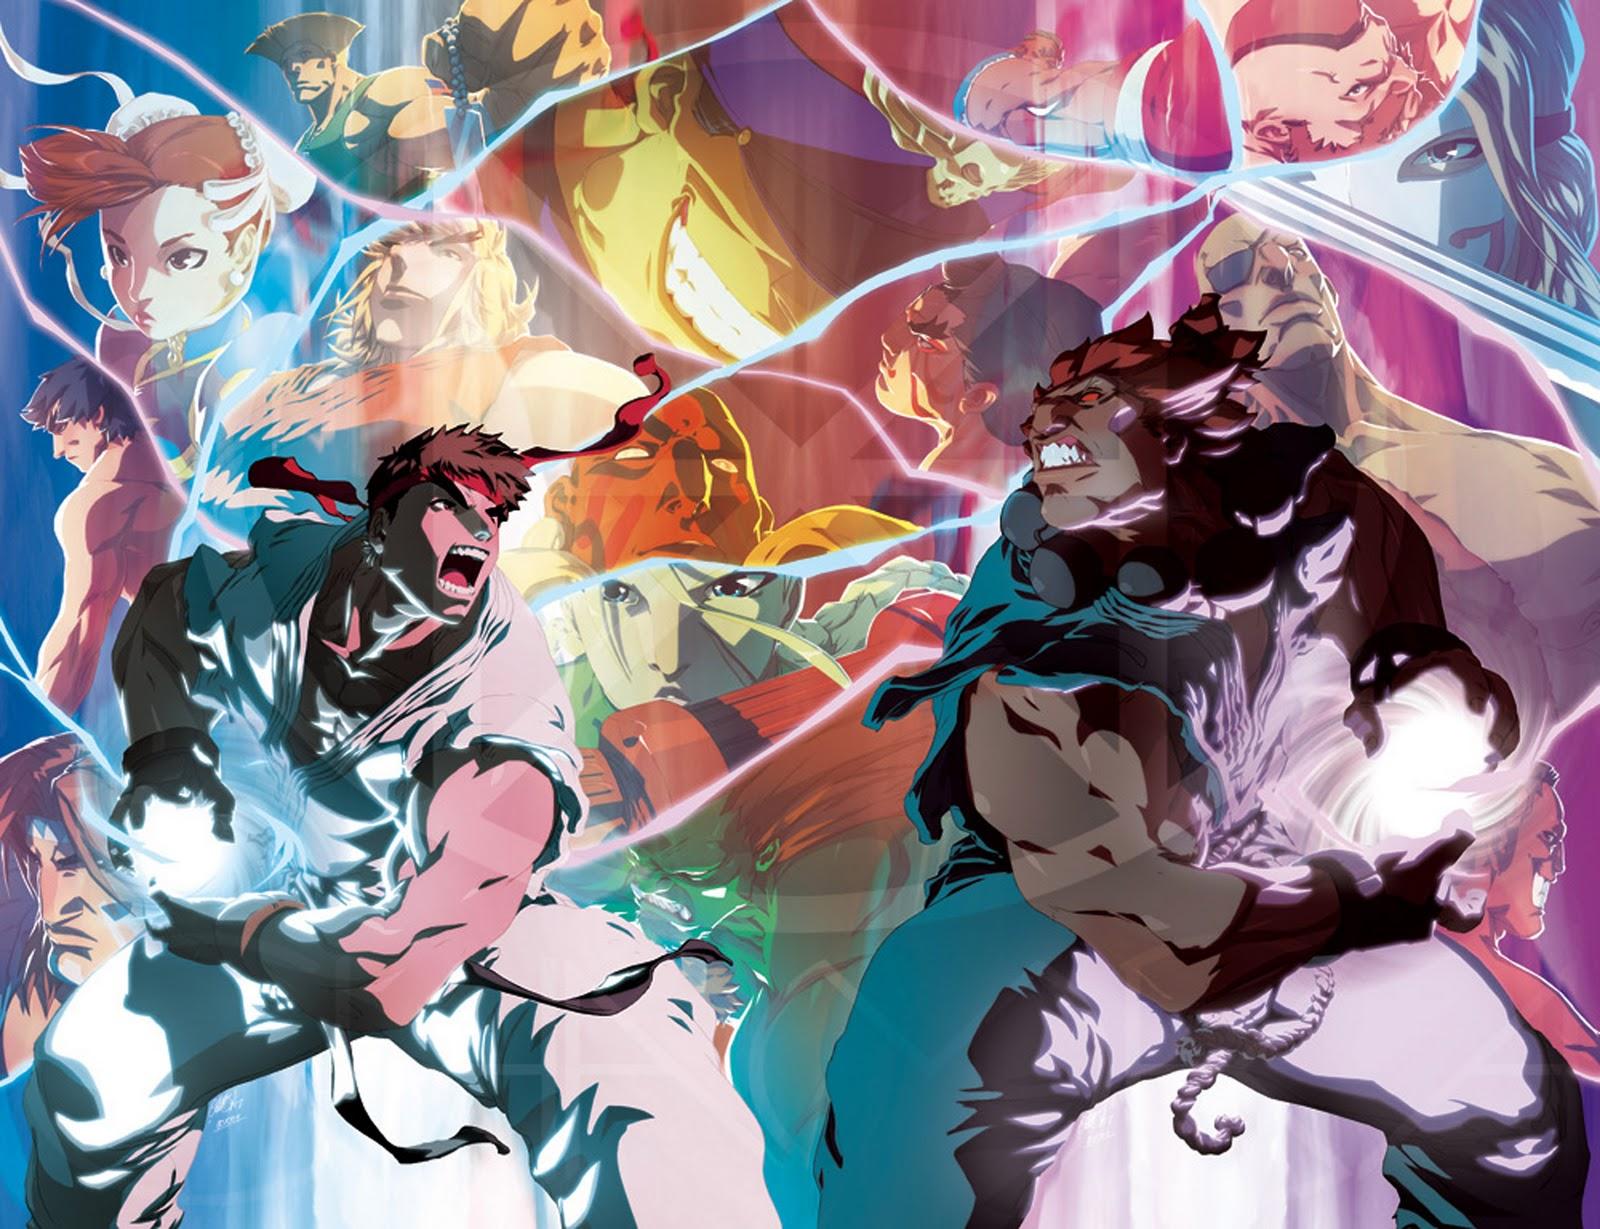 http://1.bp.blogspot.com/-w3usByQ1qDo/Tw_fXSPVkUI/AAAAAAAADM8/bAHawmTjFBY/s1600/Super+Street+Fighter+IV+iii+vs+capcom+vs+marvel+game+comic+cover+ryu+vs+akuma+action+poster+wallpaper+karate.jpg